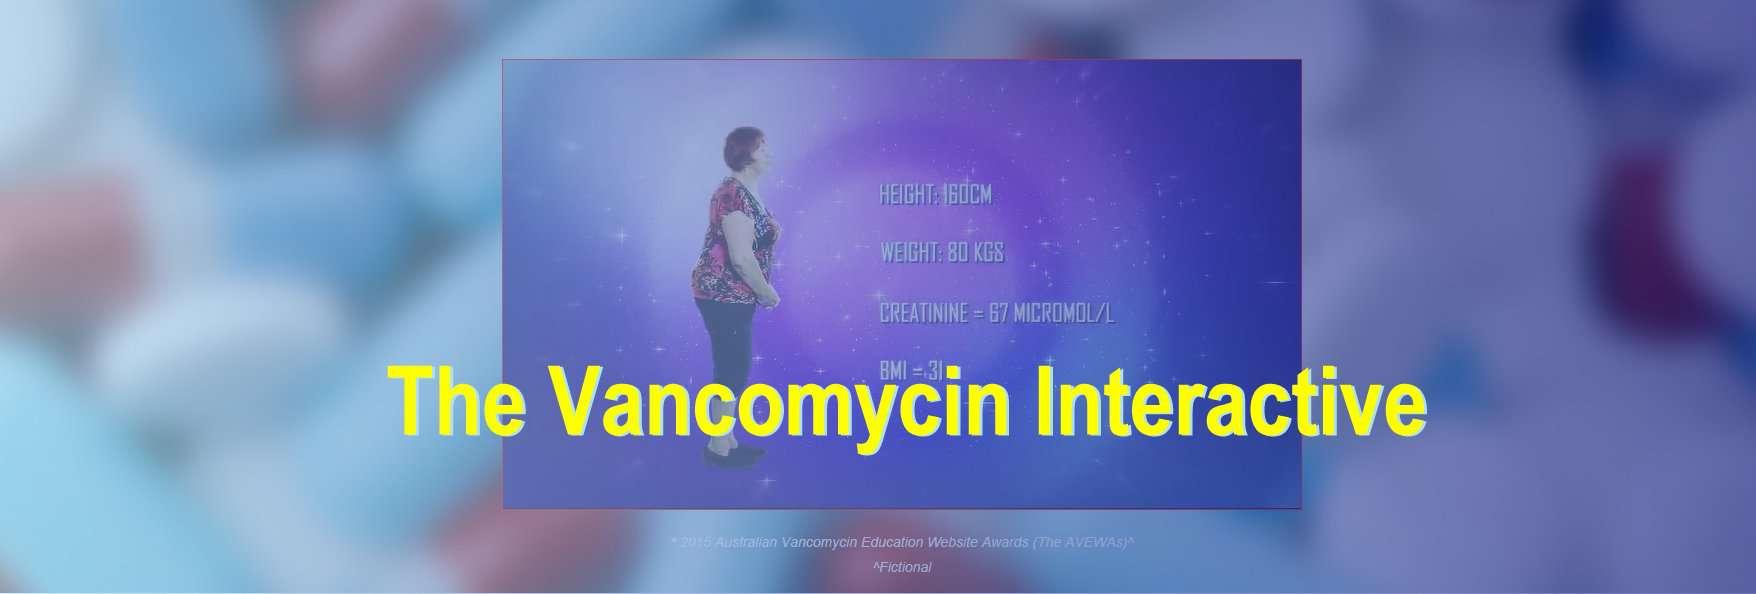 Vancomycin interactive